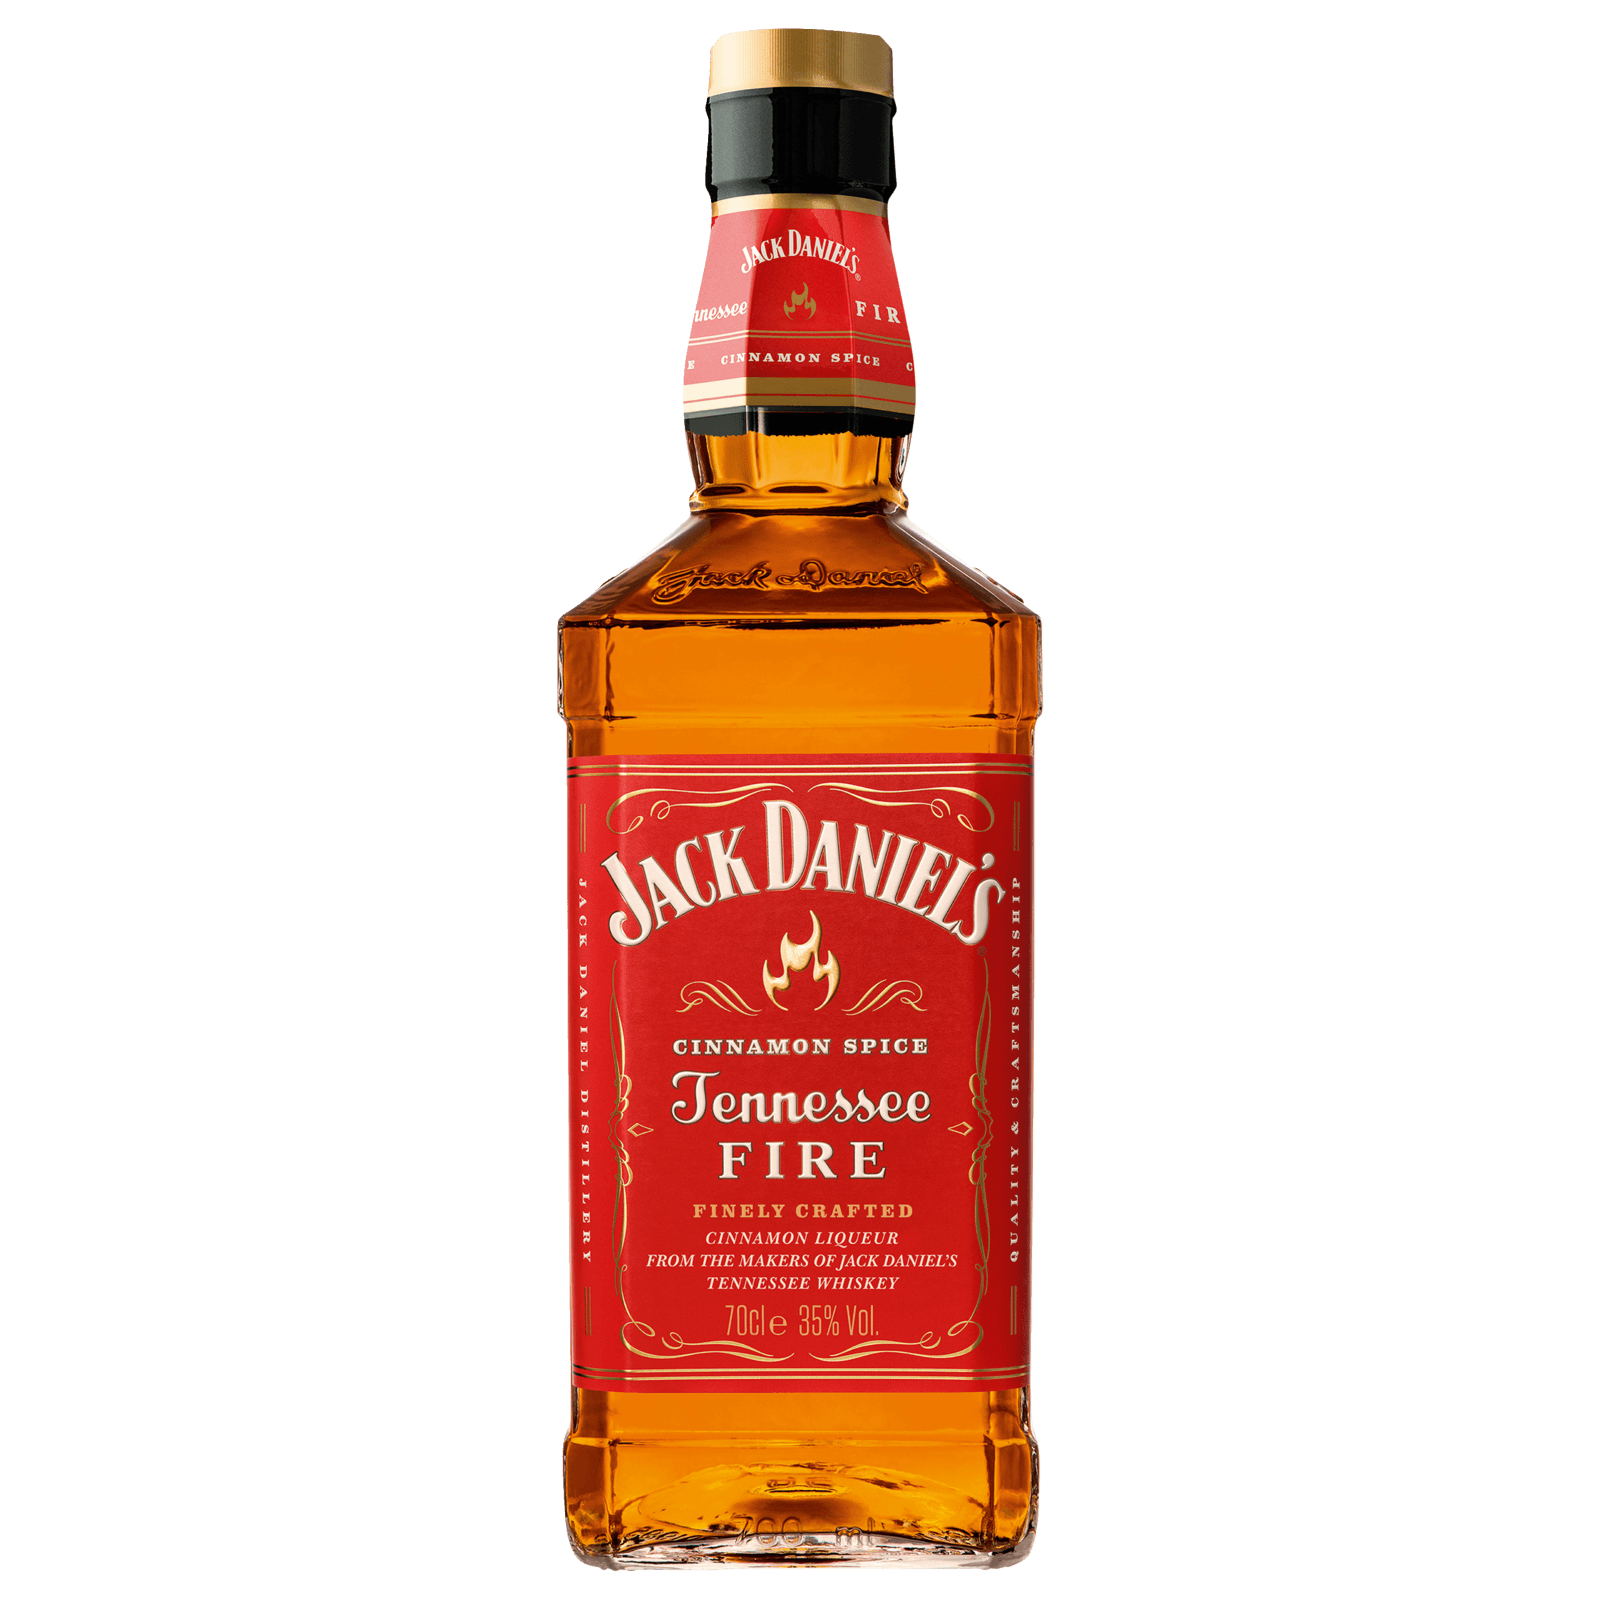 Jack Daniel\'s Tennessee Fire 0,7l bei REWE online bestellen!